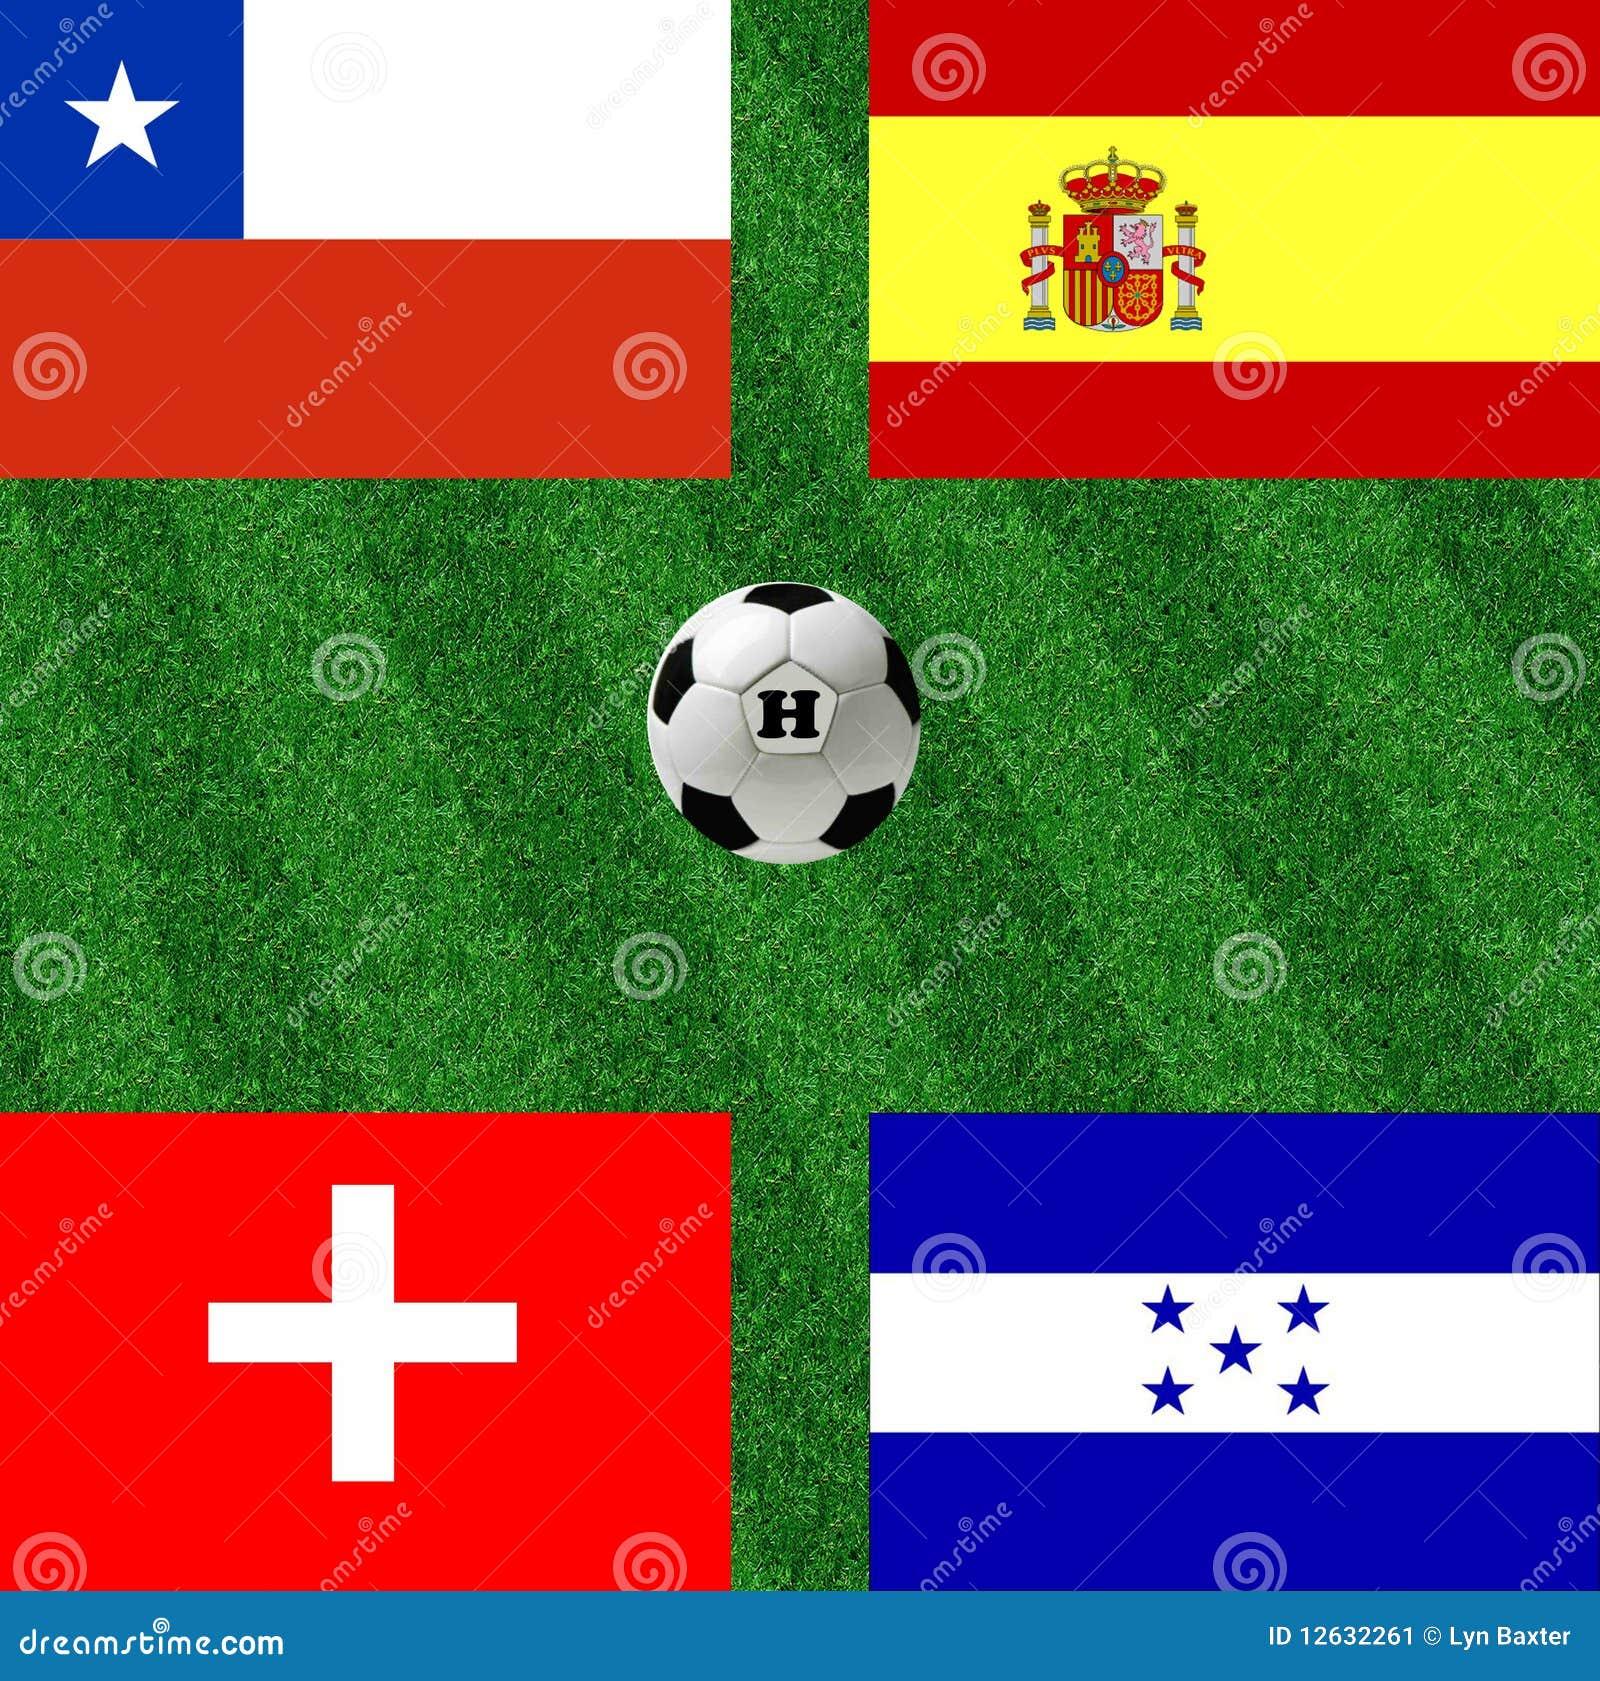 杯子组h足球世界